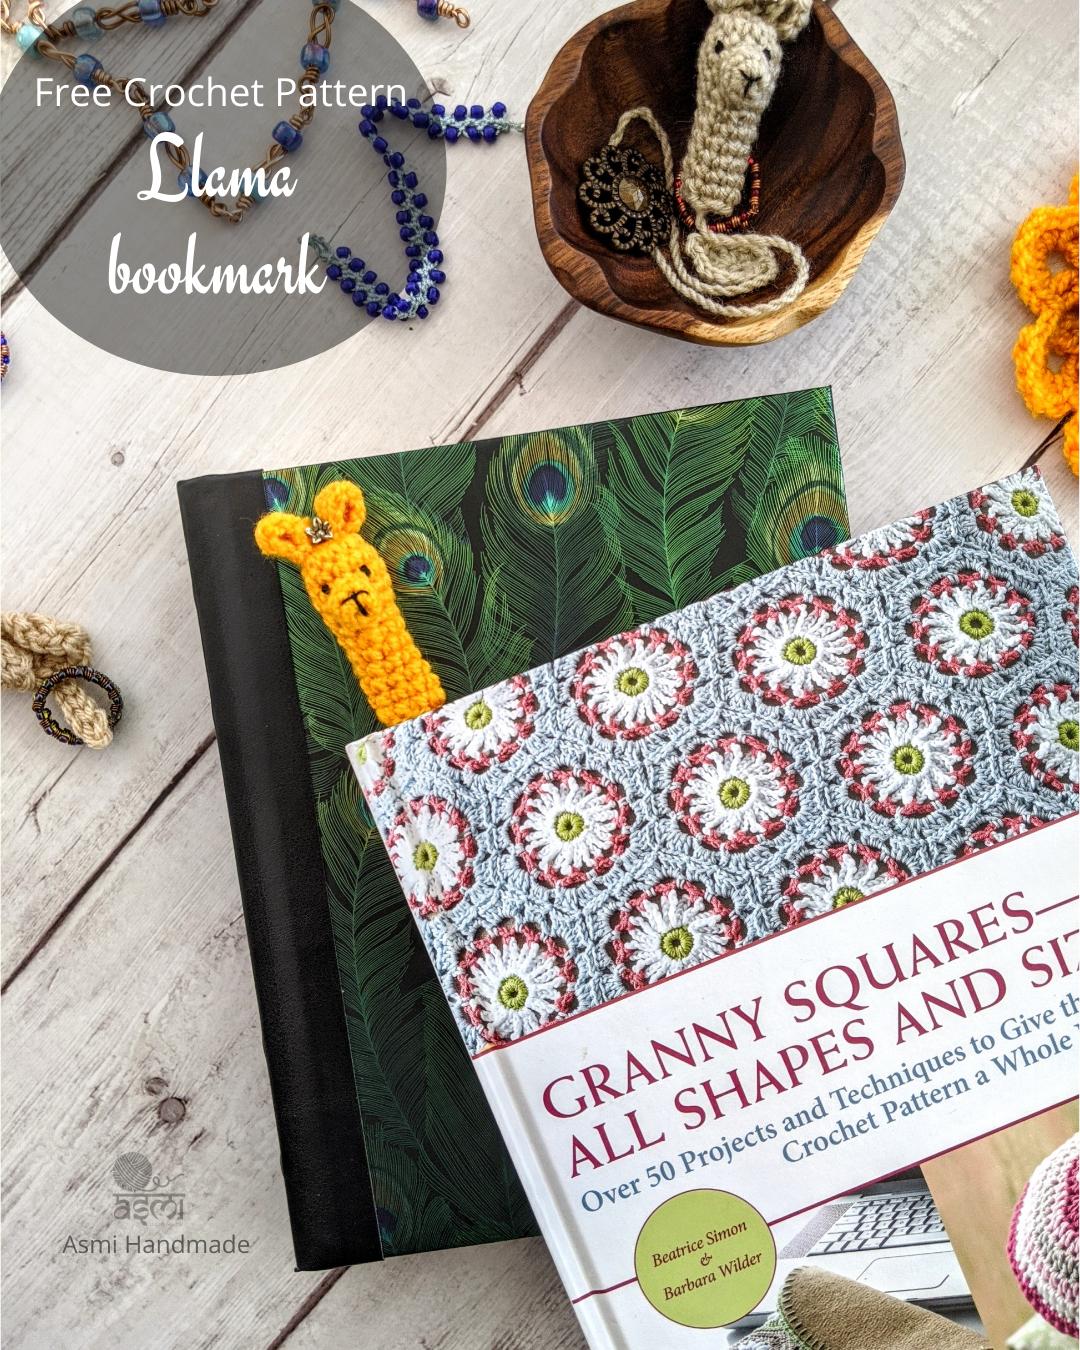 Roundup: 10 Free Crochet Patterns for Llamas (or Alpaca) - CrochetKim™ | 1350x1080